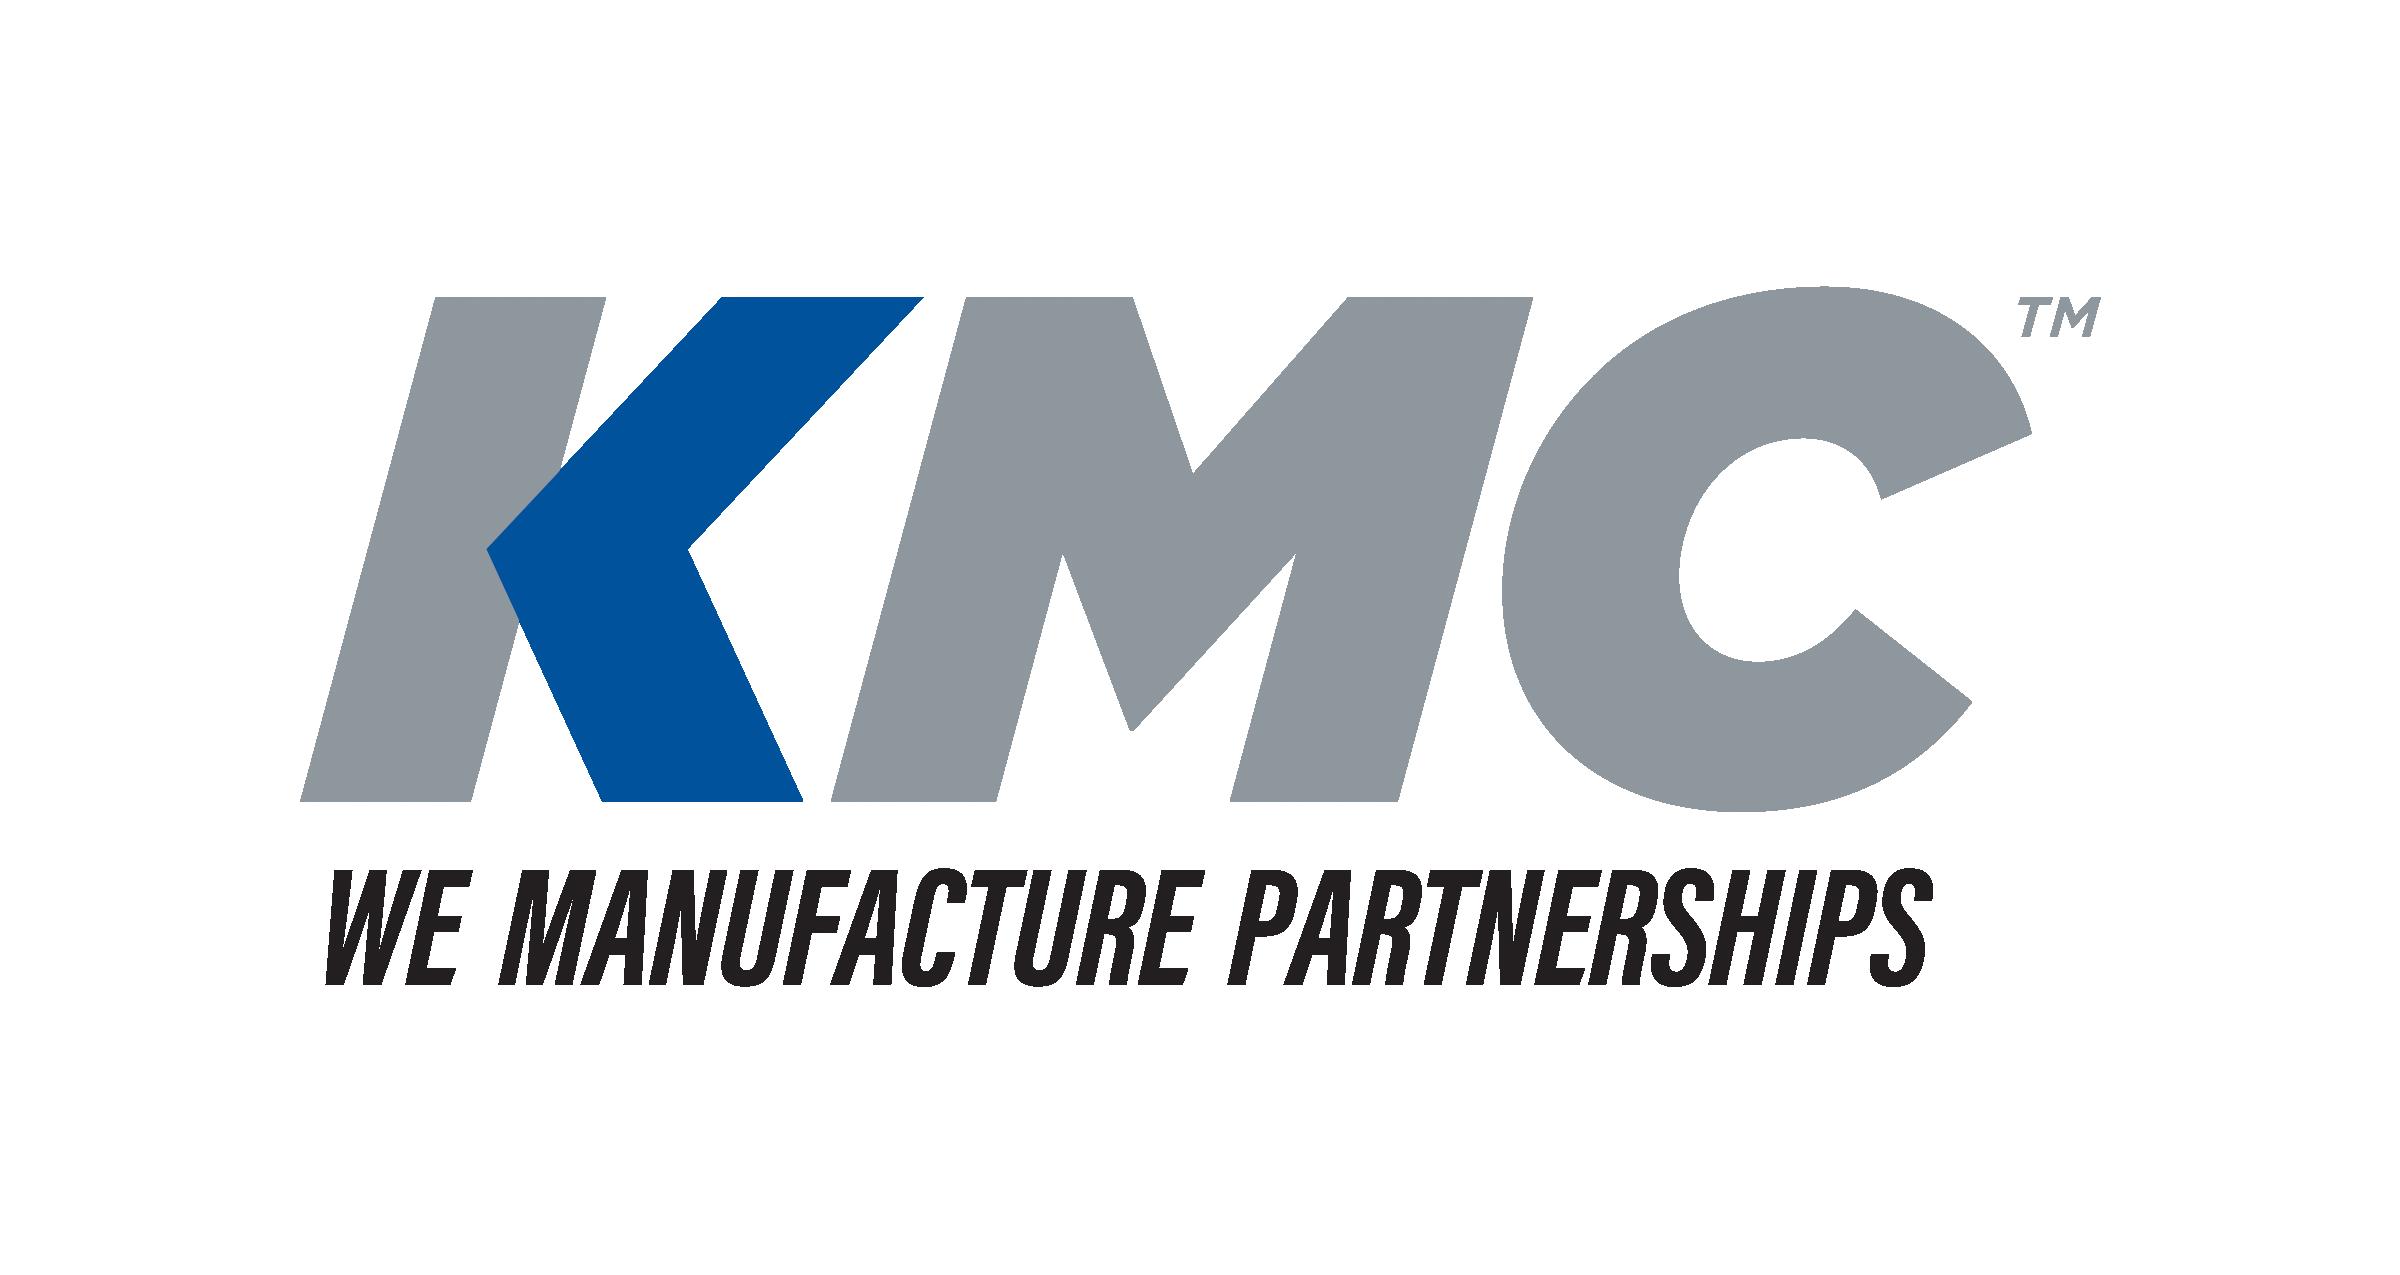 Kickhaefer Manufacturing Company